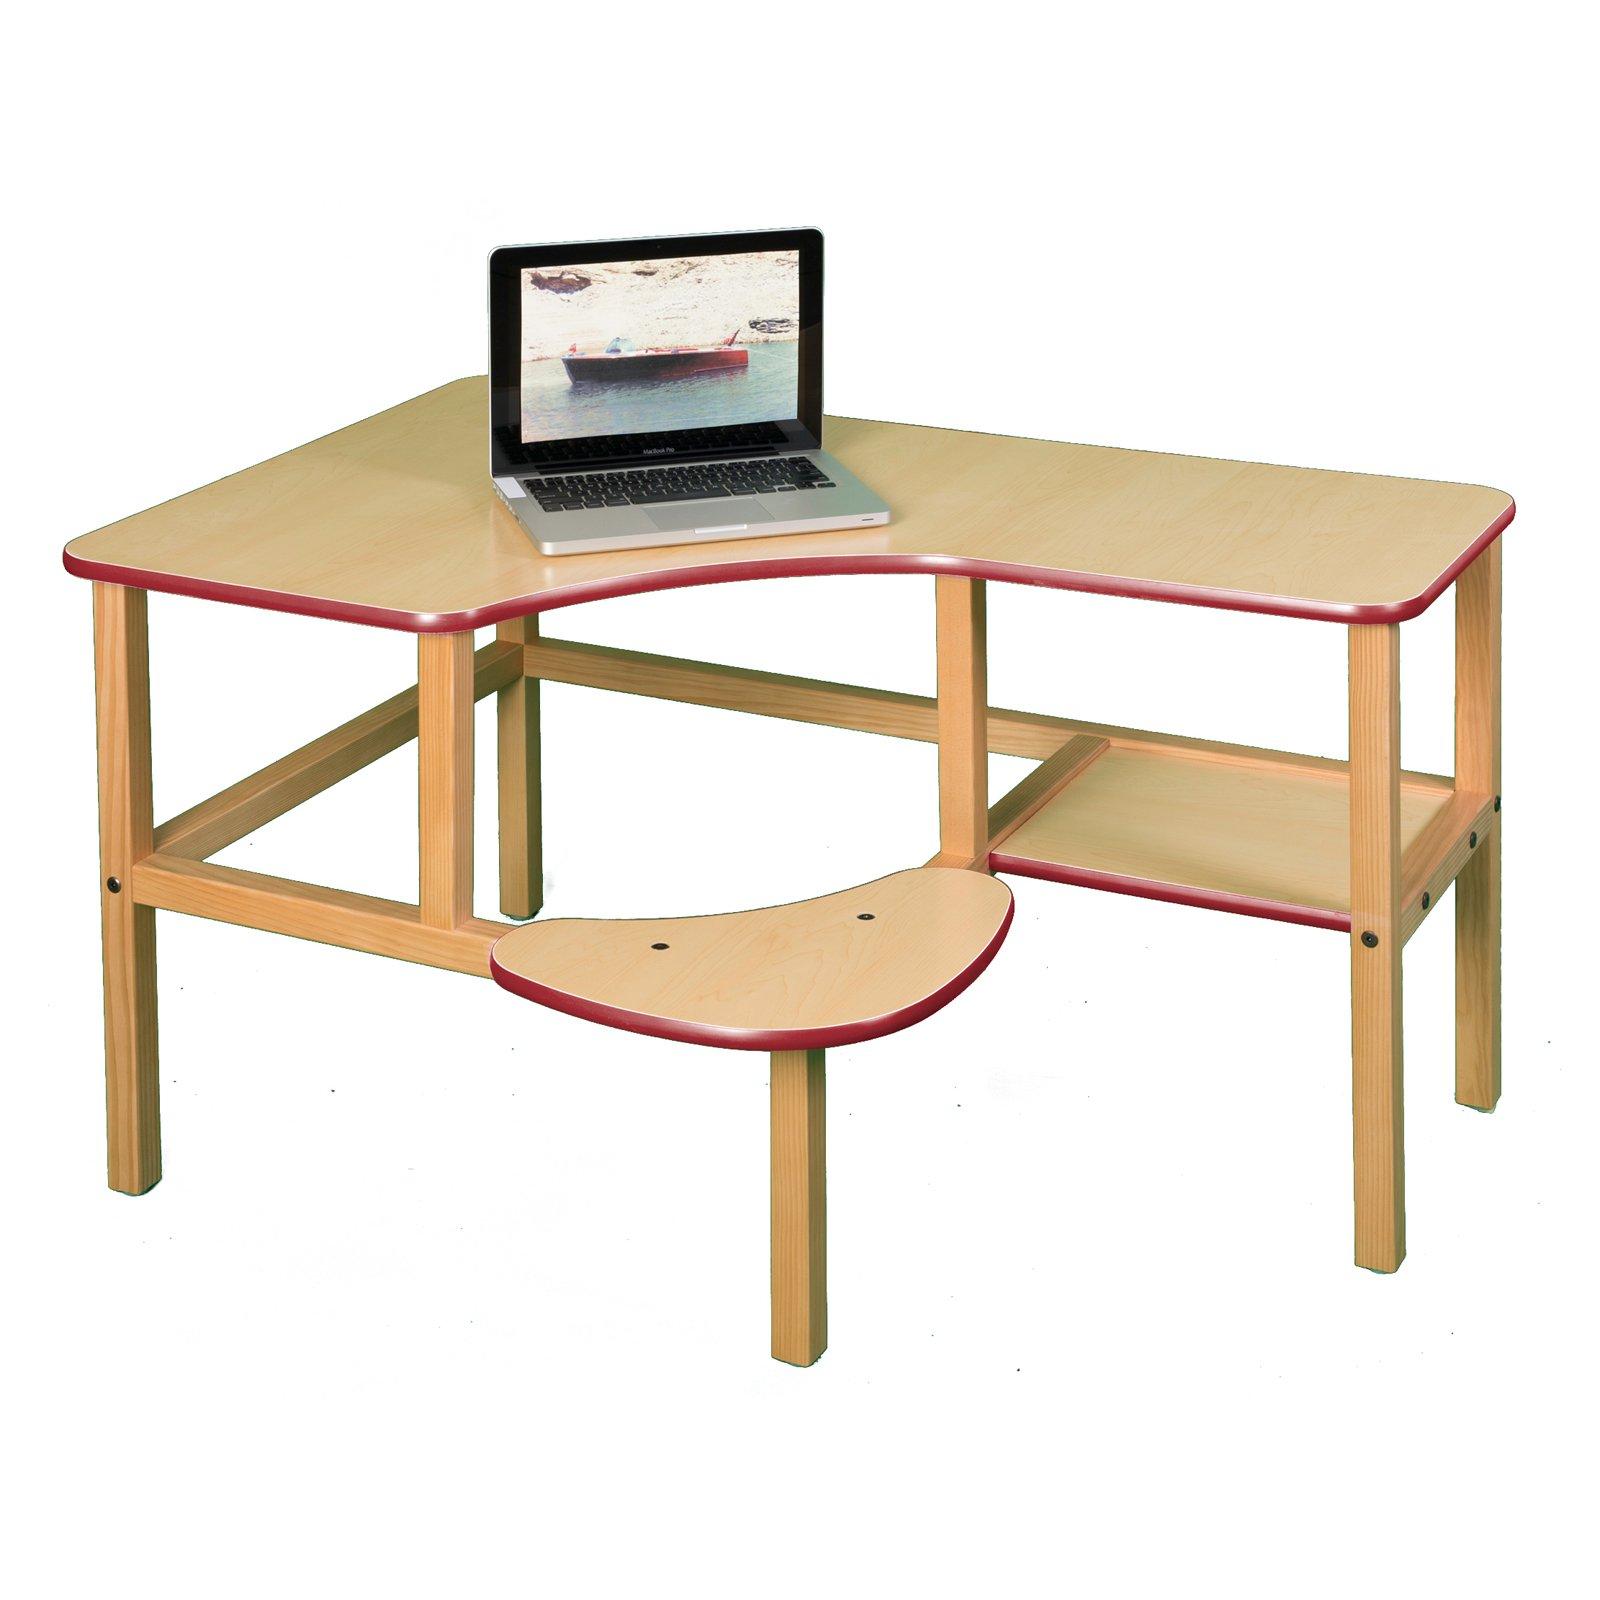 Pre-School Kids' Dent Resistant Computer Desk (White / White)